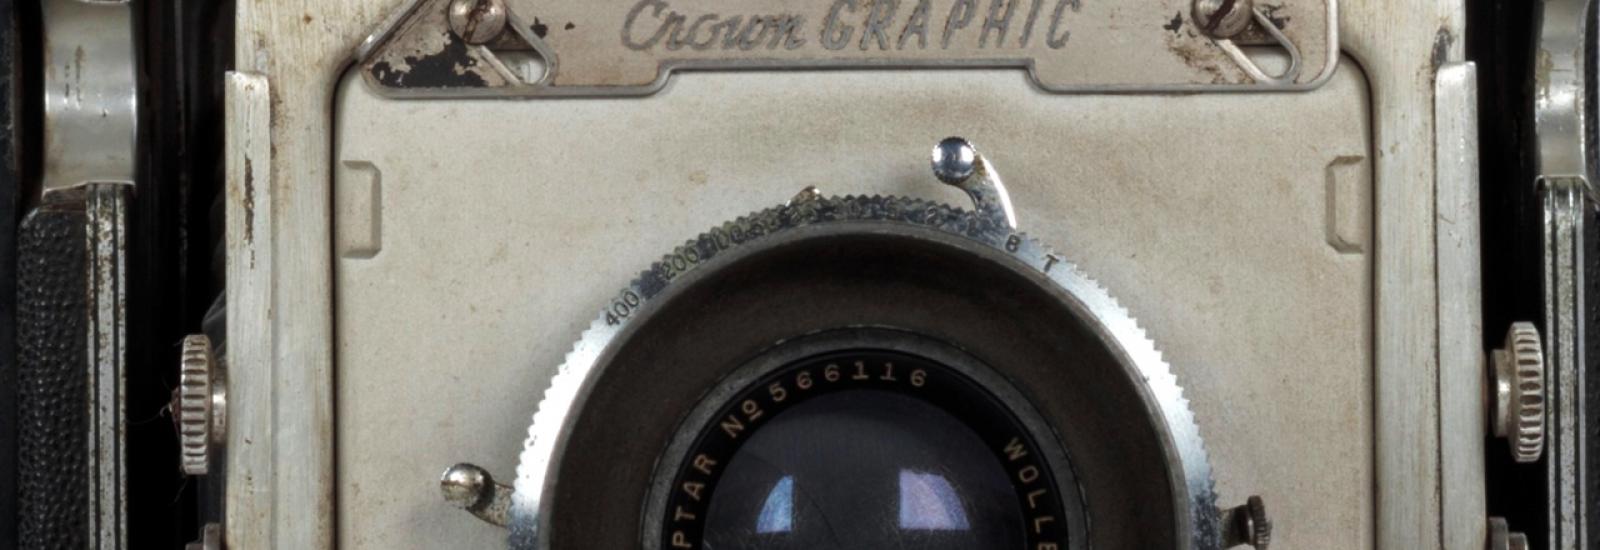 Close up of a vintage camera lens